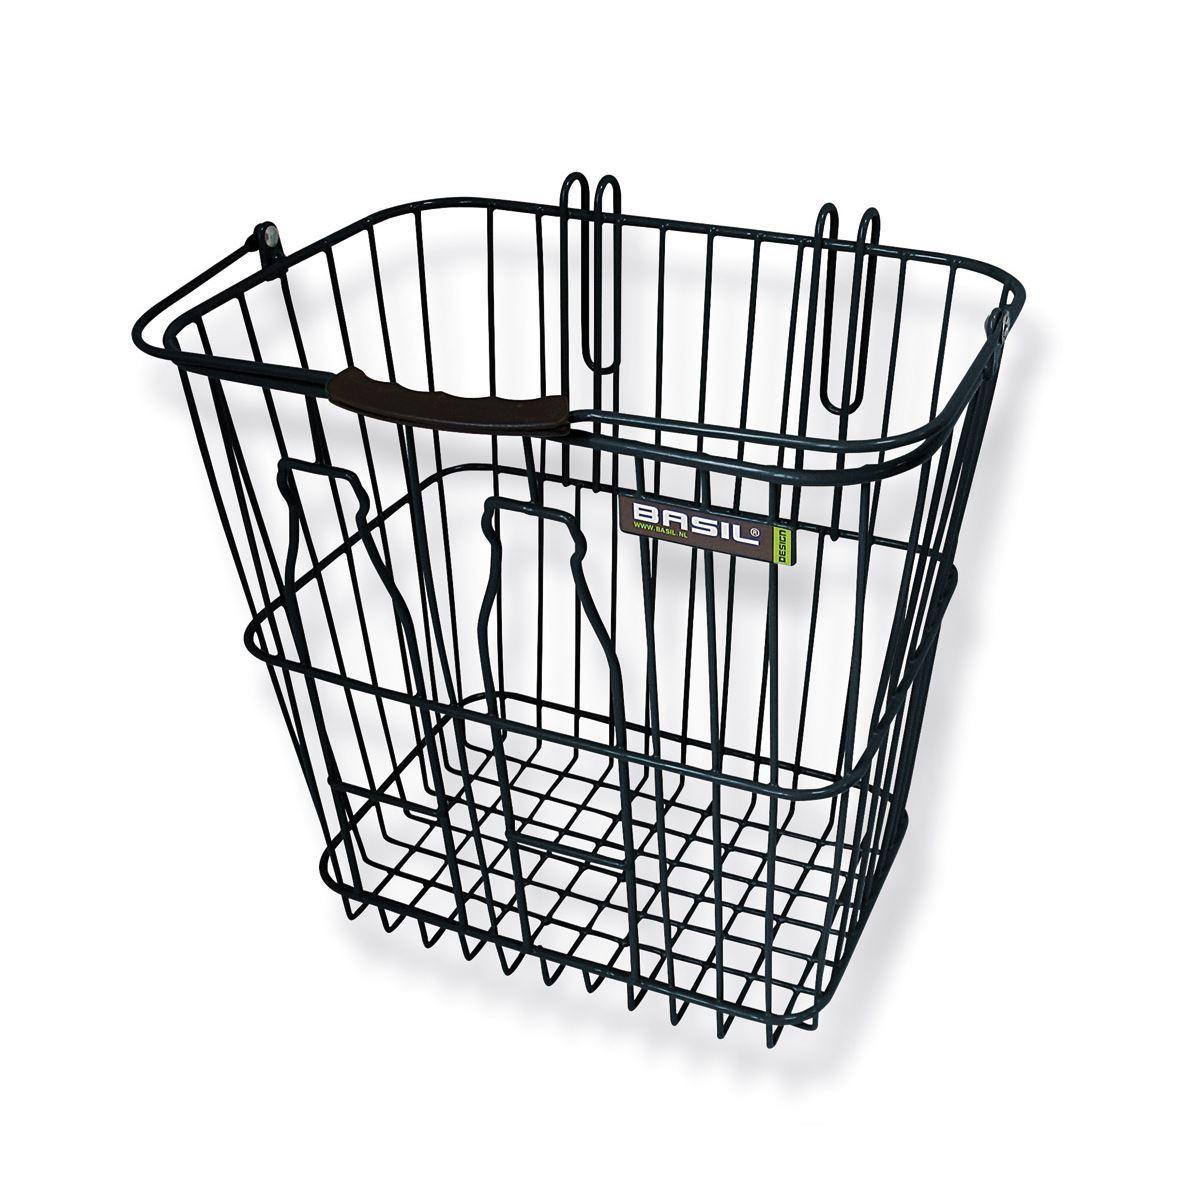 Basil Memories Bottle Basket - Cykelkurv - Sort | Bike baskets